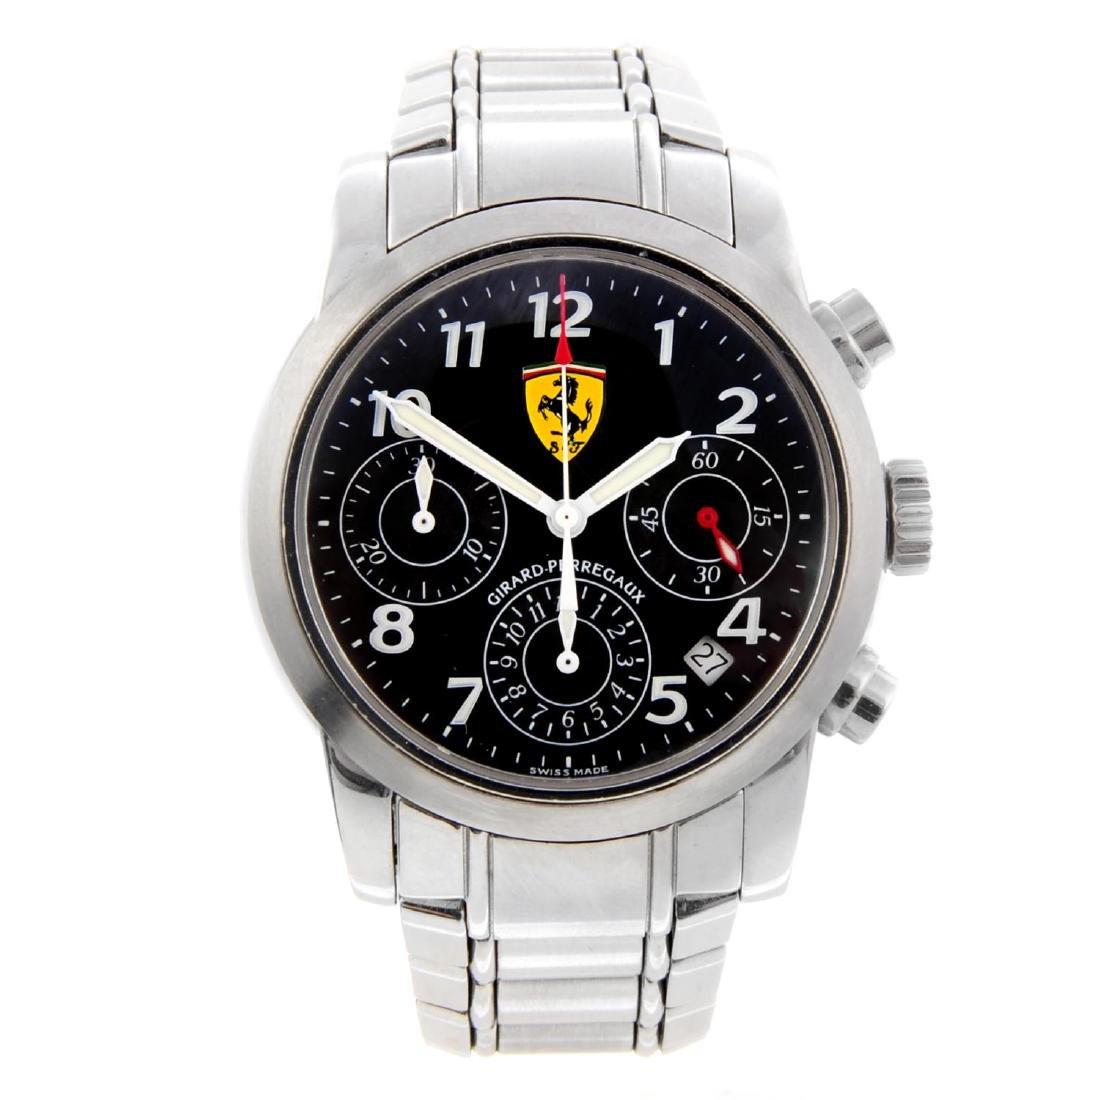 GIRARD-PERREGAUX - a gentleman's Ferrari chronograph